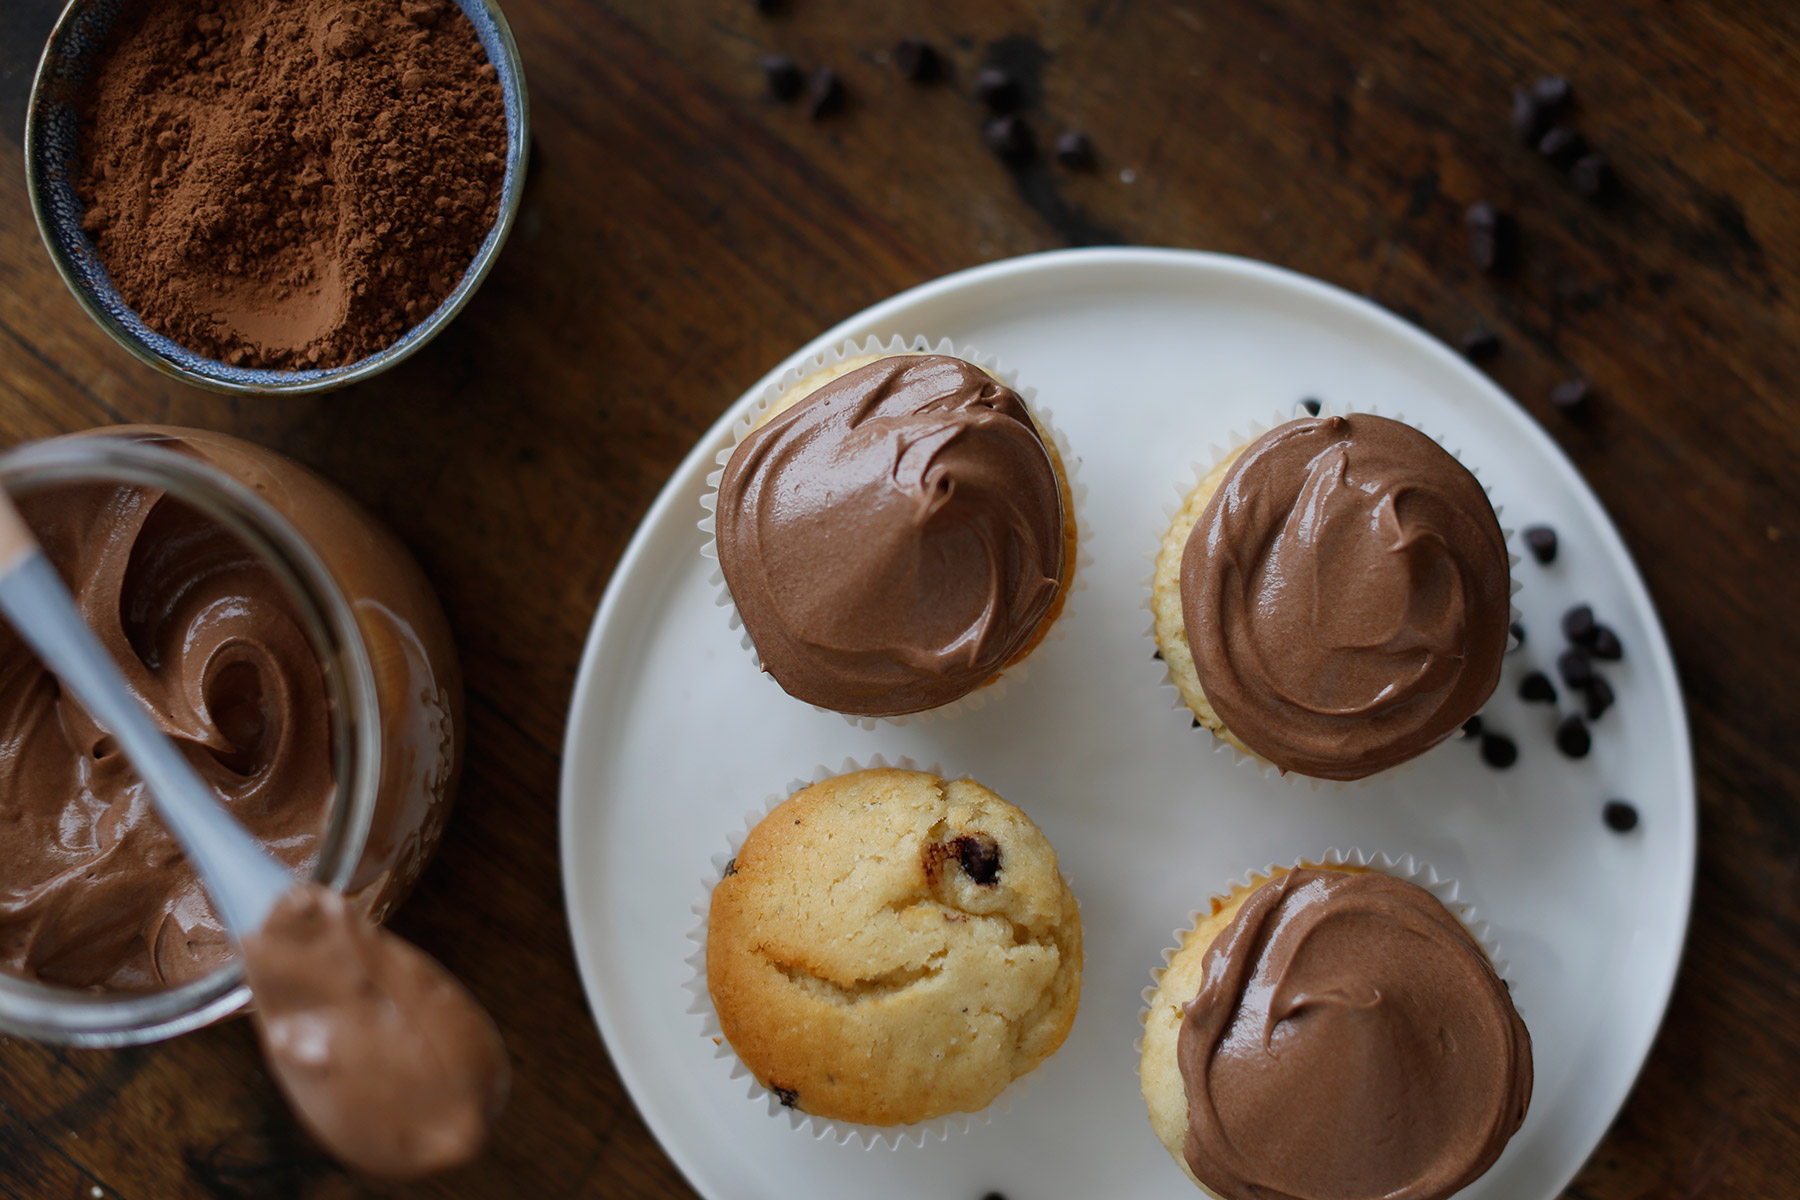 Dark-Chocolate-and-Vanilla-Cupcakes-with-Milk-Chocolate-Icing-2